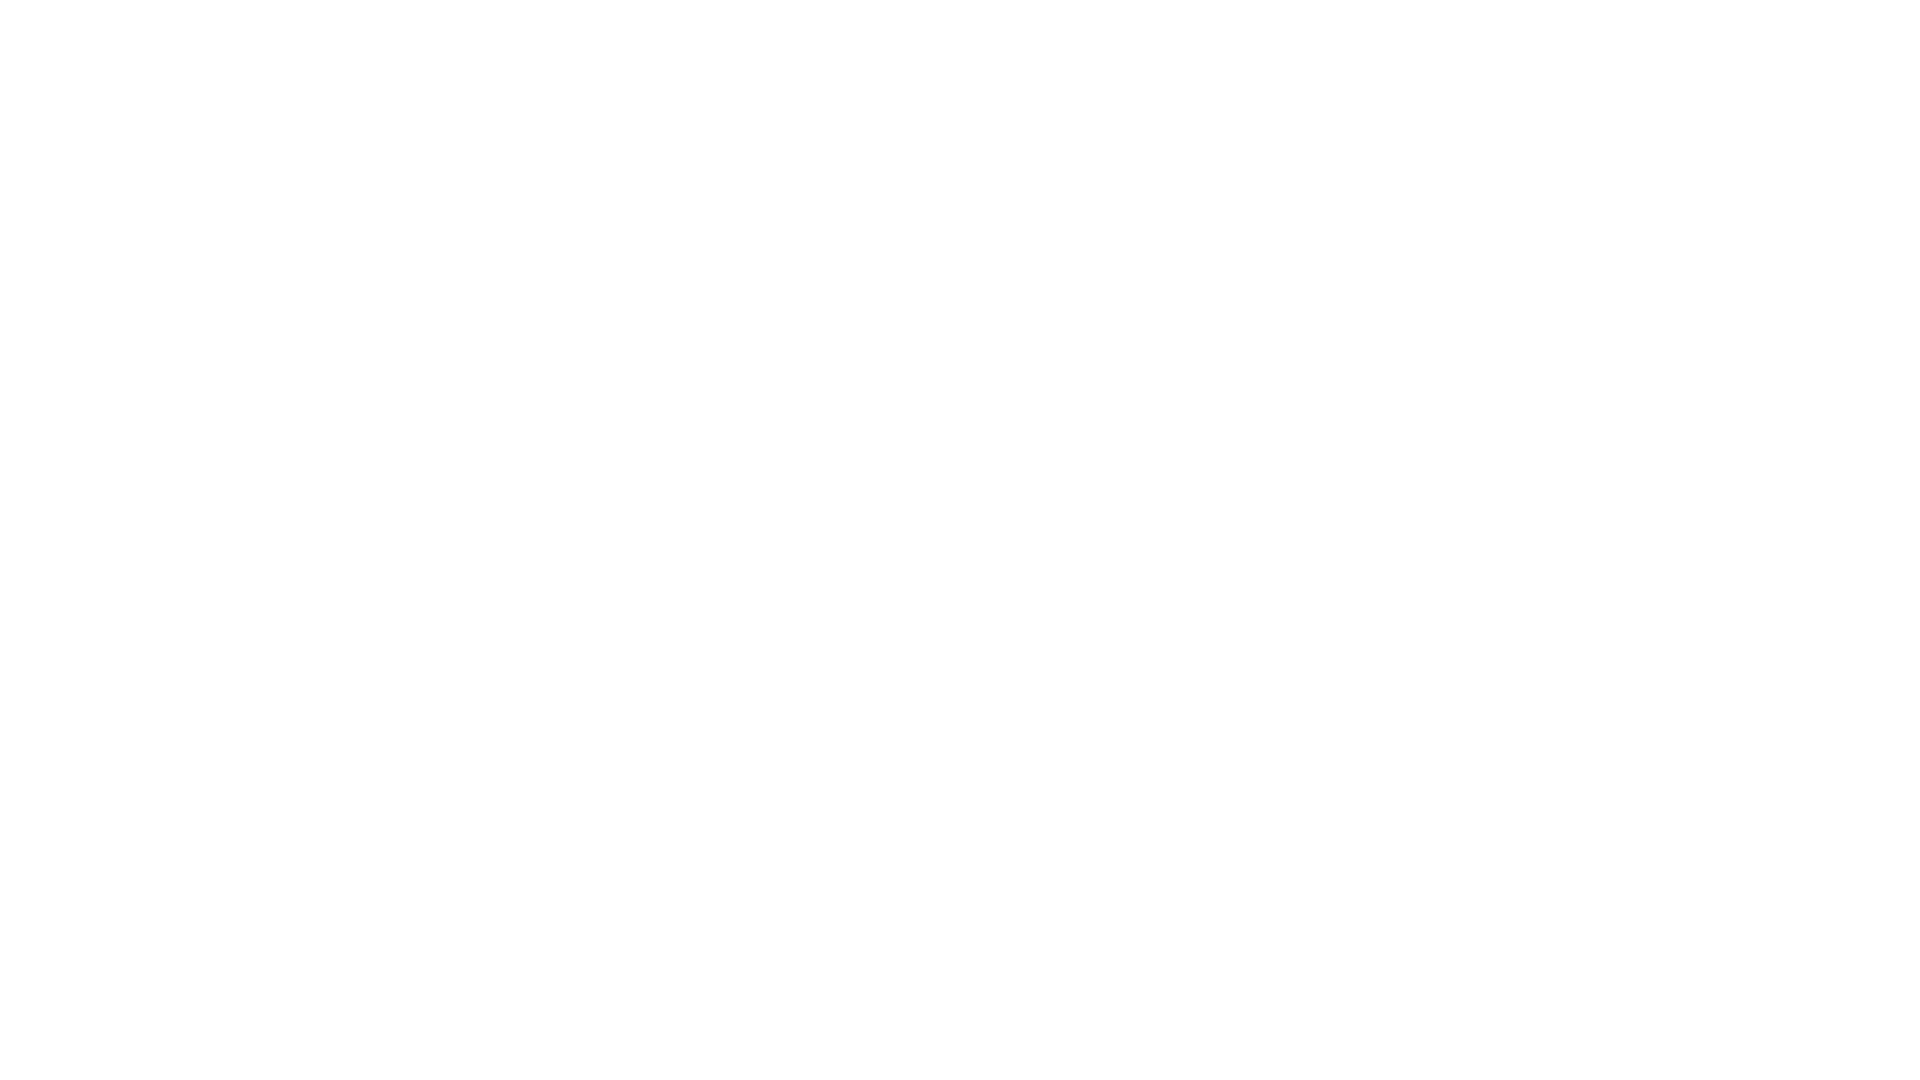 BaoHiroo-03.png